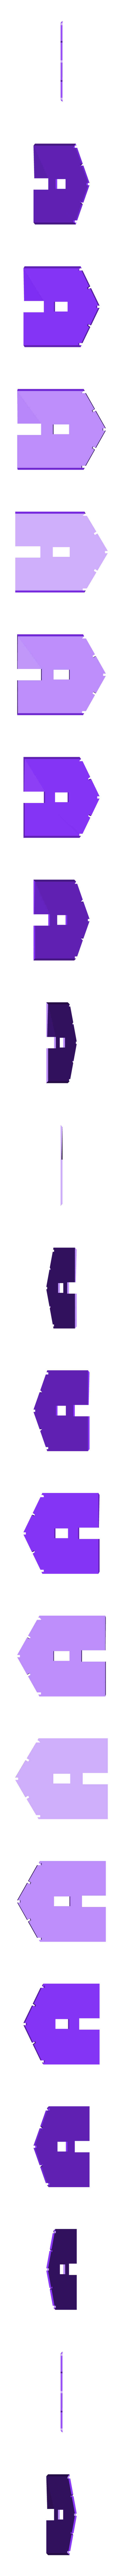 facade_cotéB.STL Download STL file Station 3 Doors PLM Coursan • 3D print model, dede34500